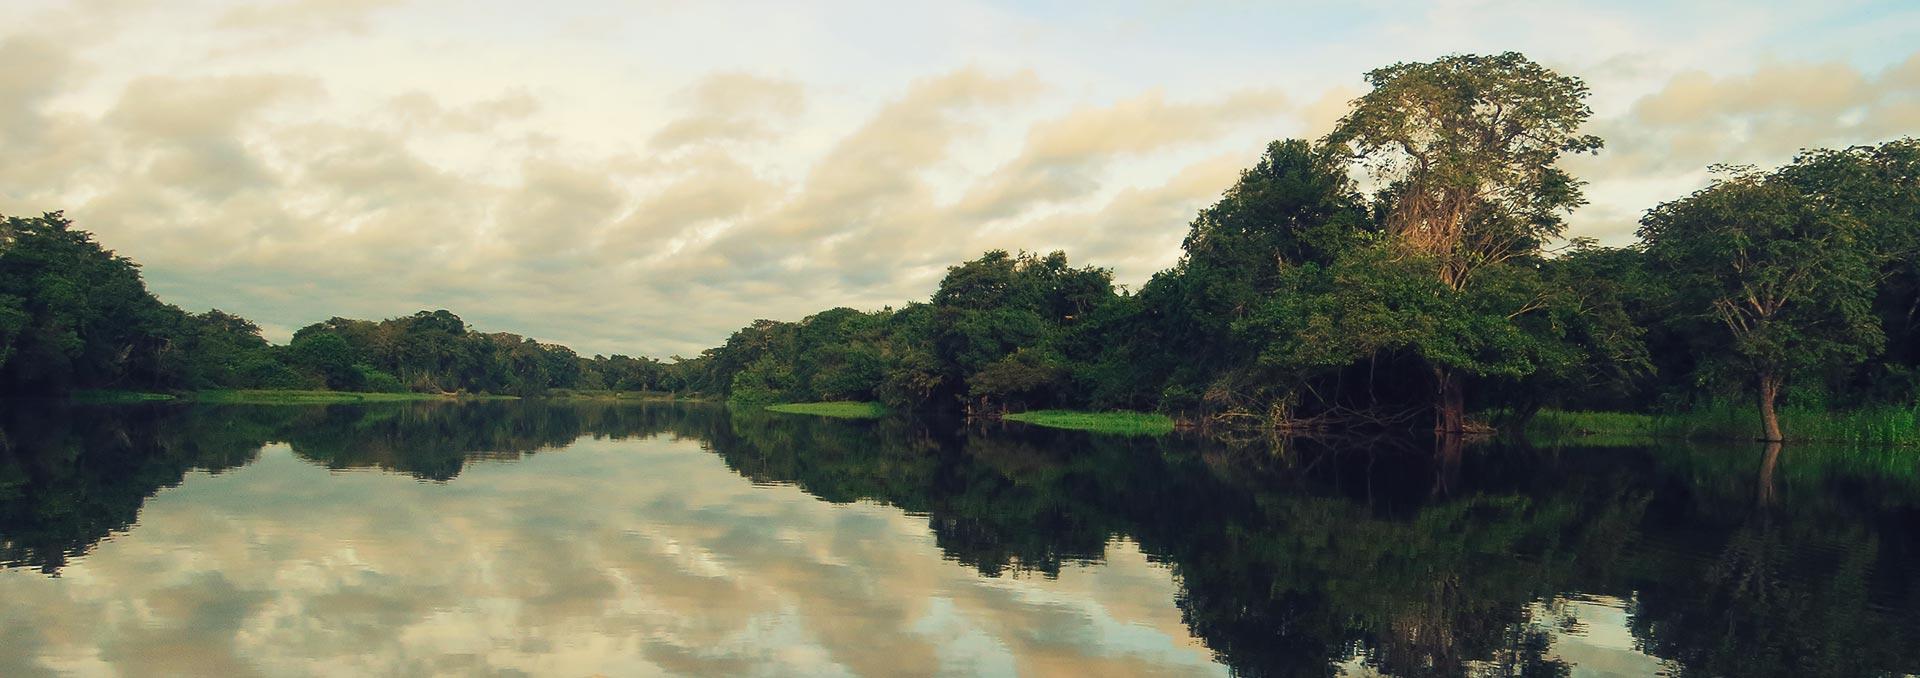 Peru Amazonas